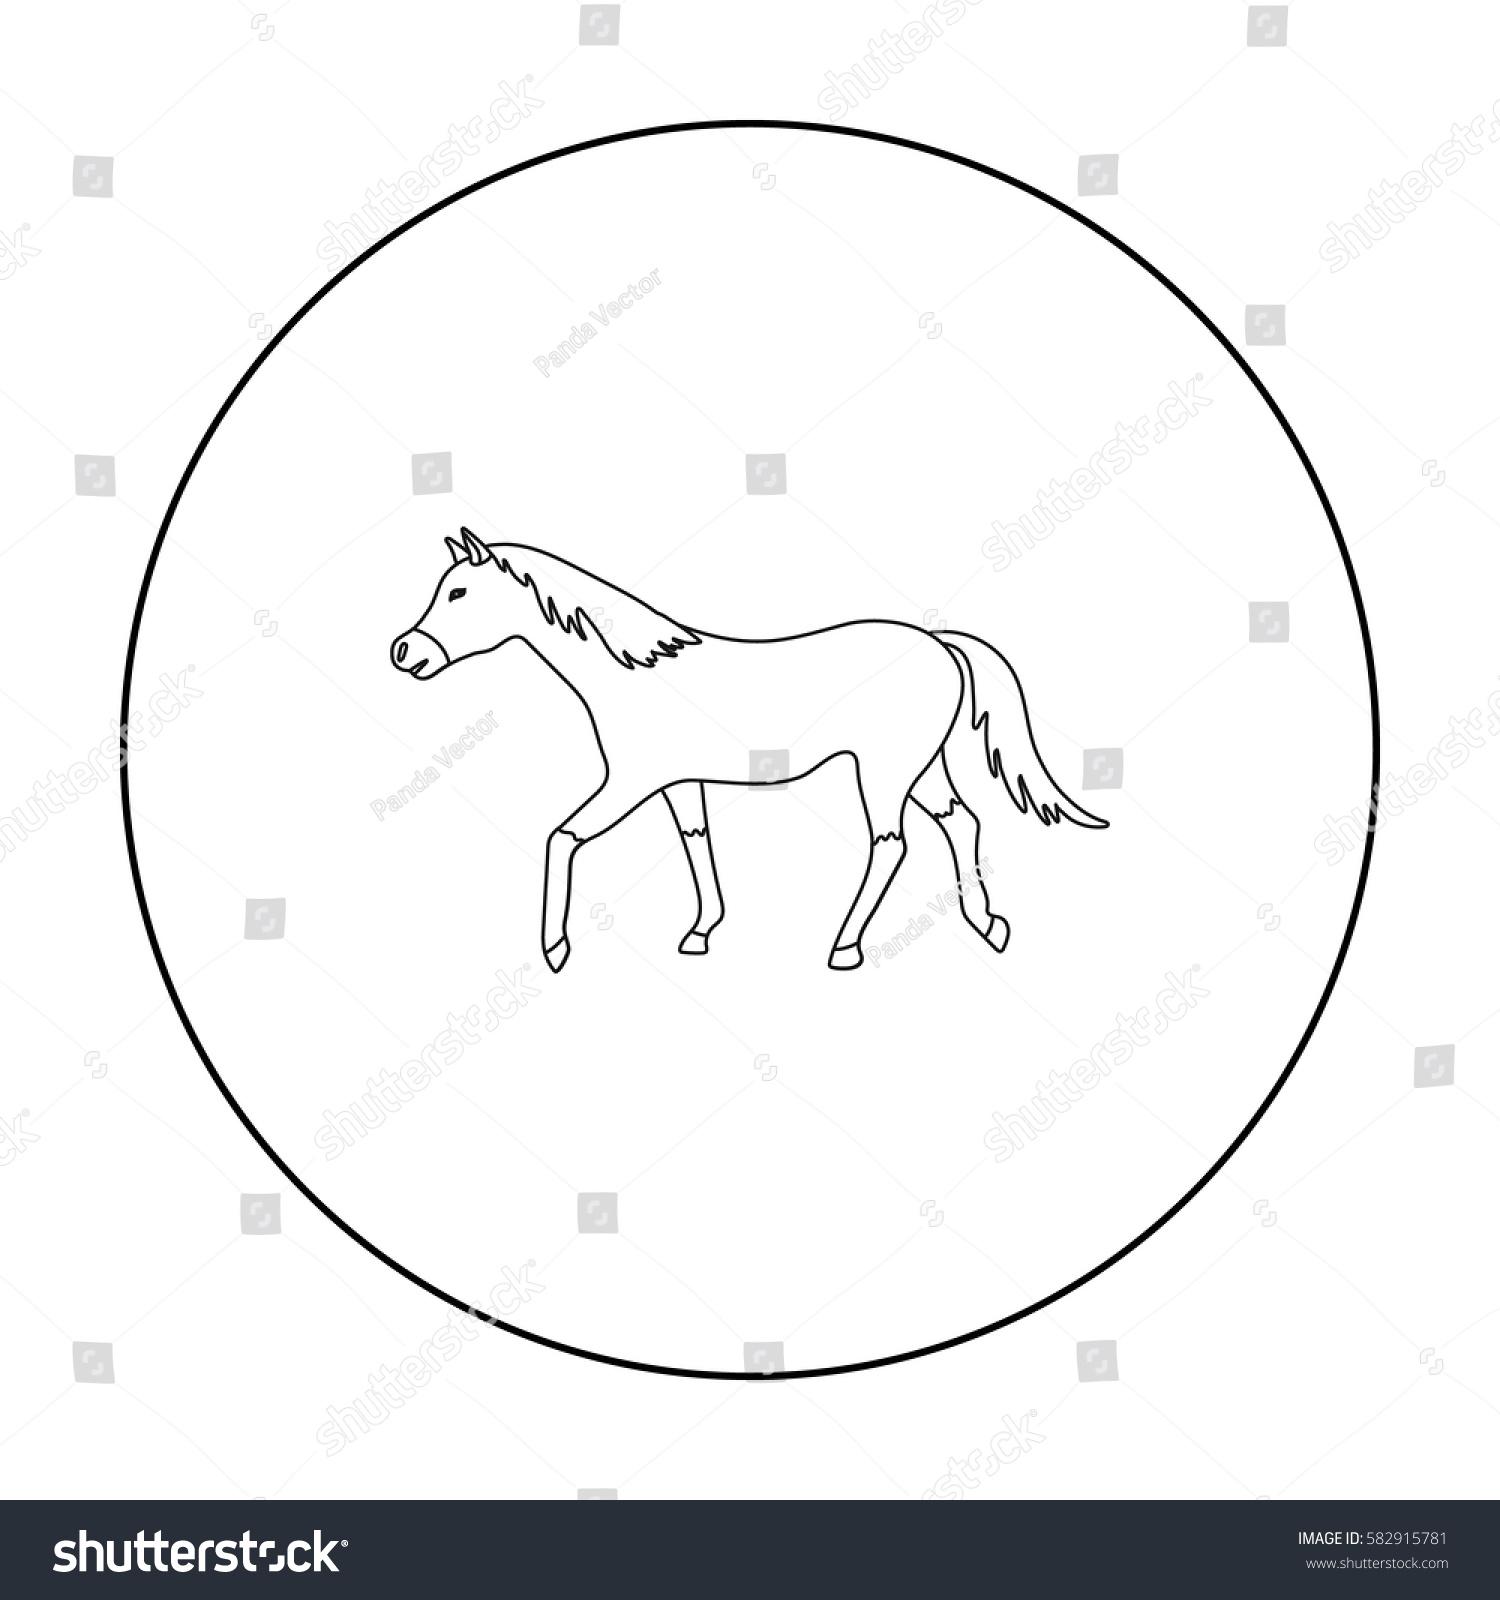 Horse icon outline style isolated on stock vector 582915781 horse icon in outline style isolated on white background hippodrome and horse symbol stock vector buycottarizona